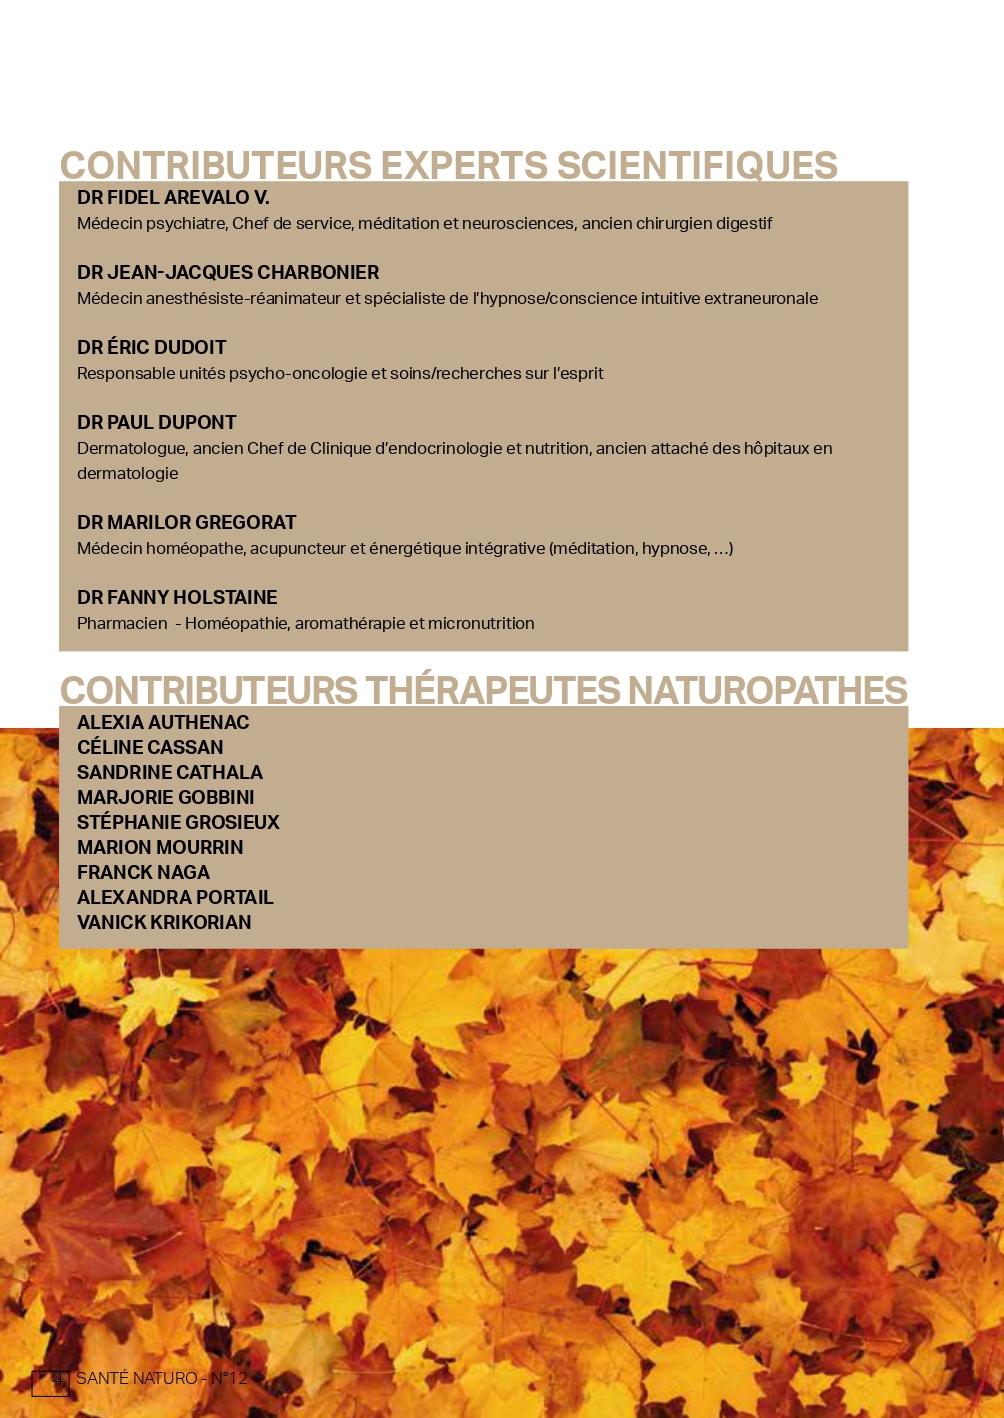 contributeurs-sante-naturo-12-sante-naturelle-integrative--et-medecine-douce-naturopathie